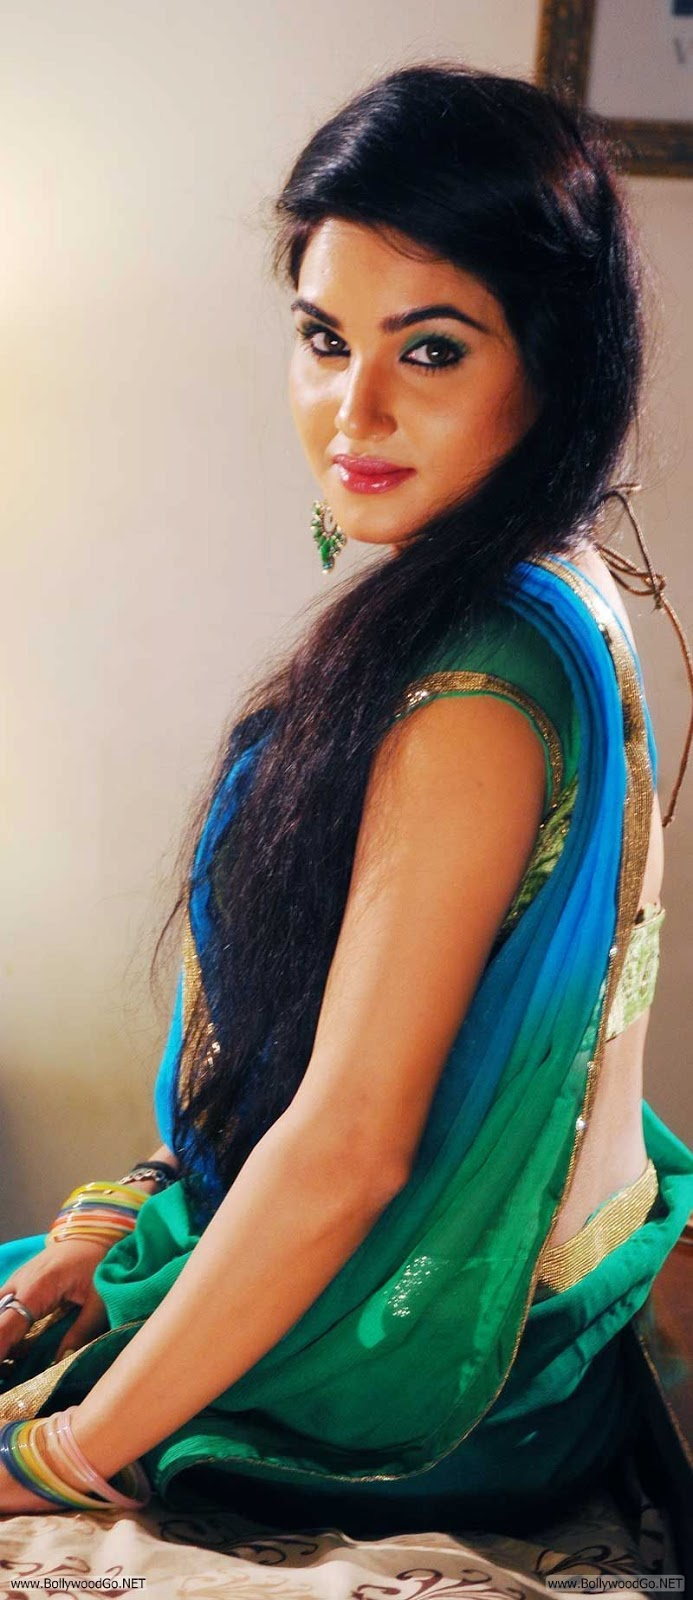 Kavya Singh Pictures from Half Boil Movie Kavya+(2)